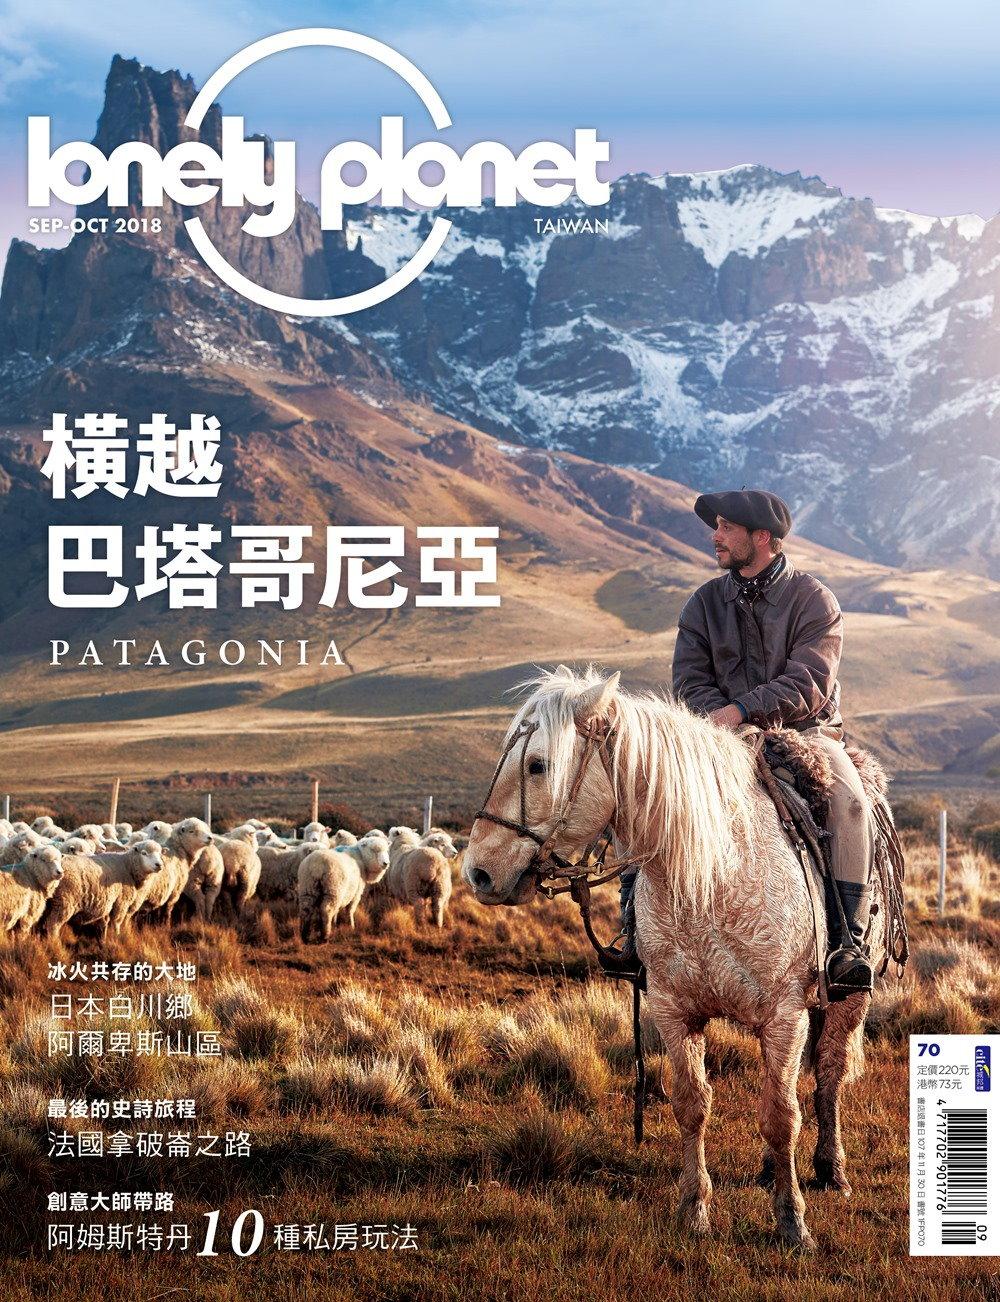 孤獨星球Lonely Planet 9月號/2018第70期